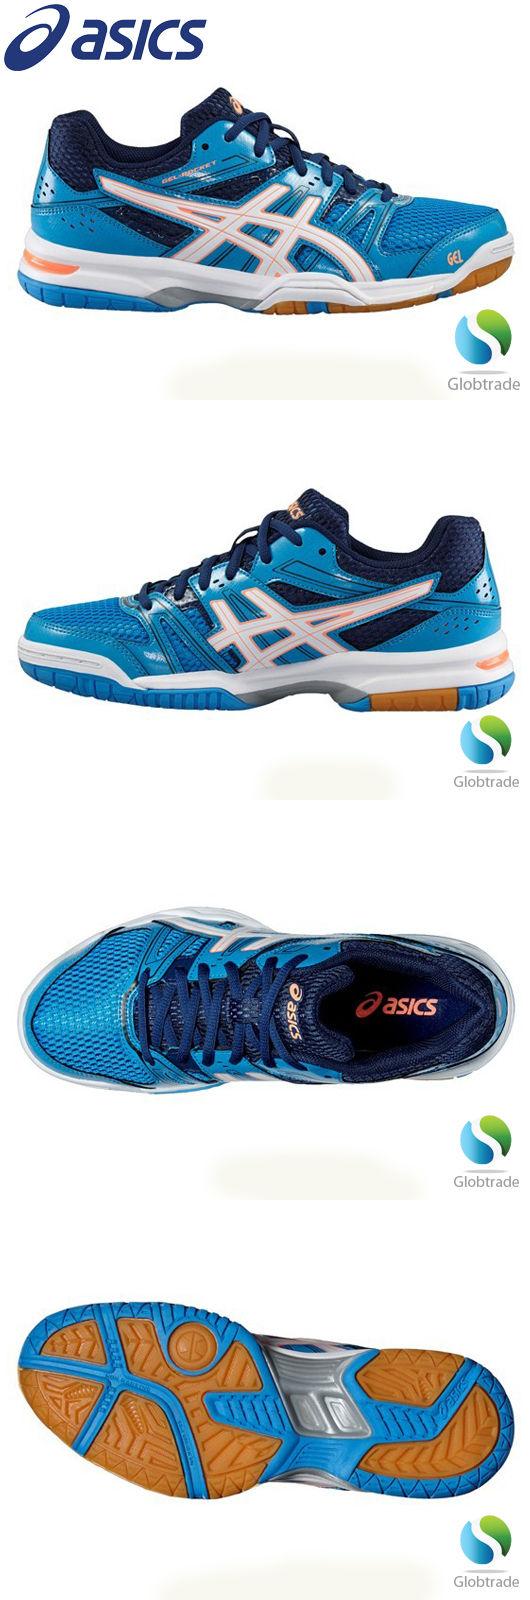 Autre 7 Volleyball 2919: Asics Gel Rocket 7 4301 B455n 4301 S Femmes S Pour 5785c80 - madridturismobitcoin.website